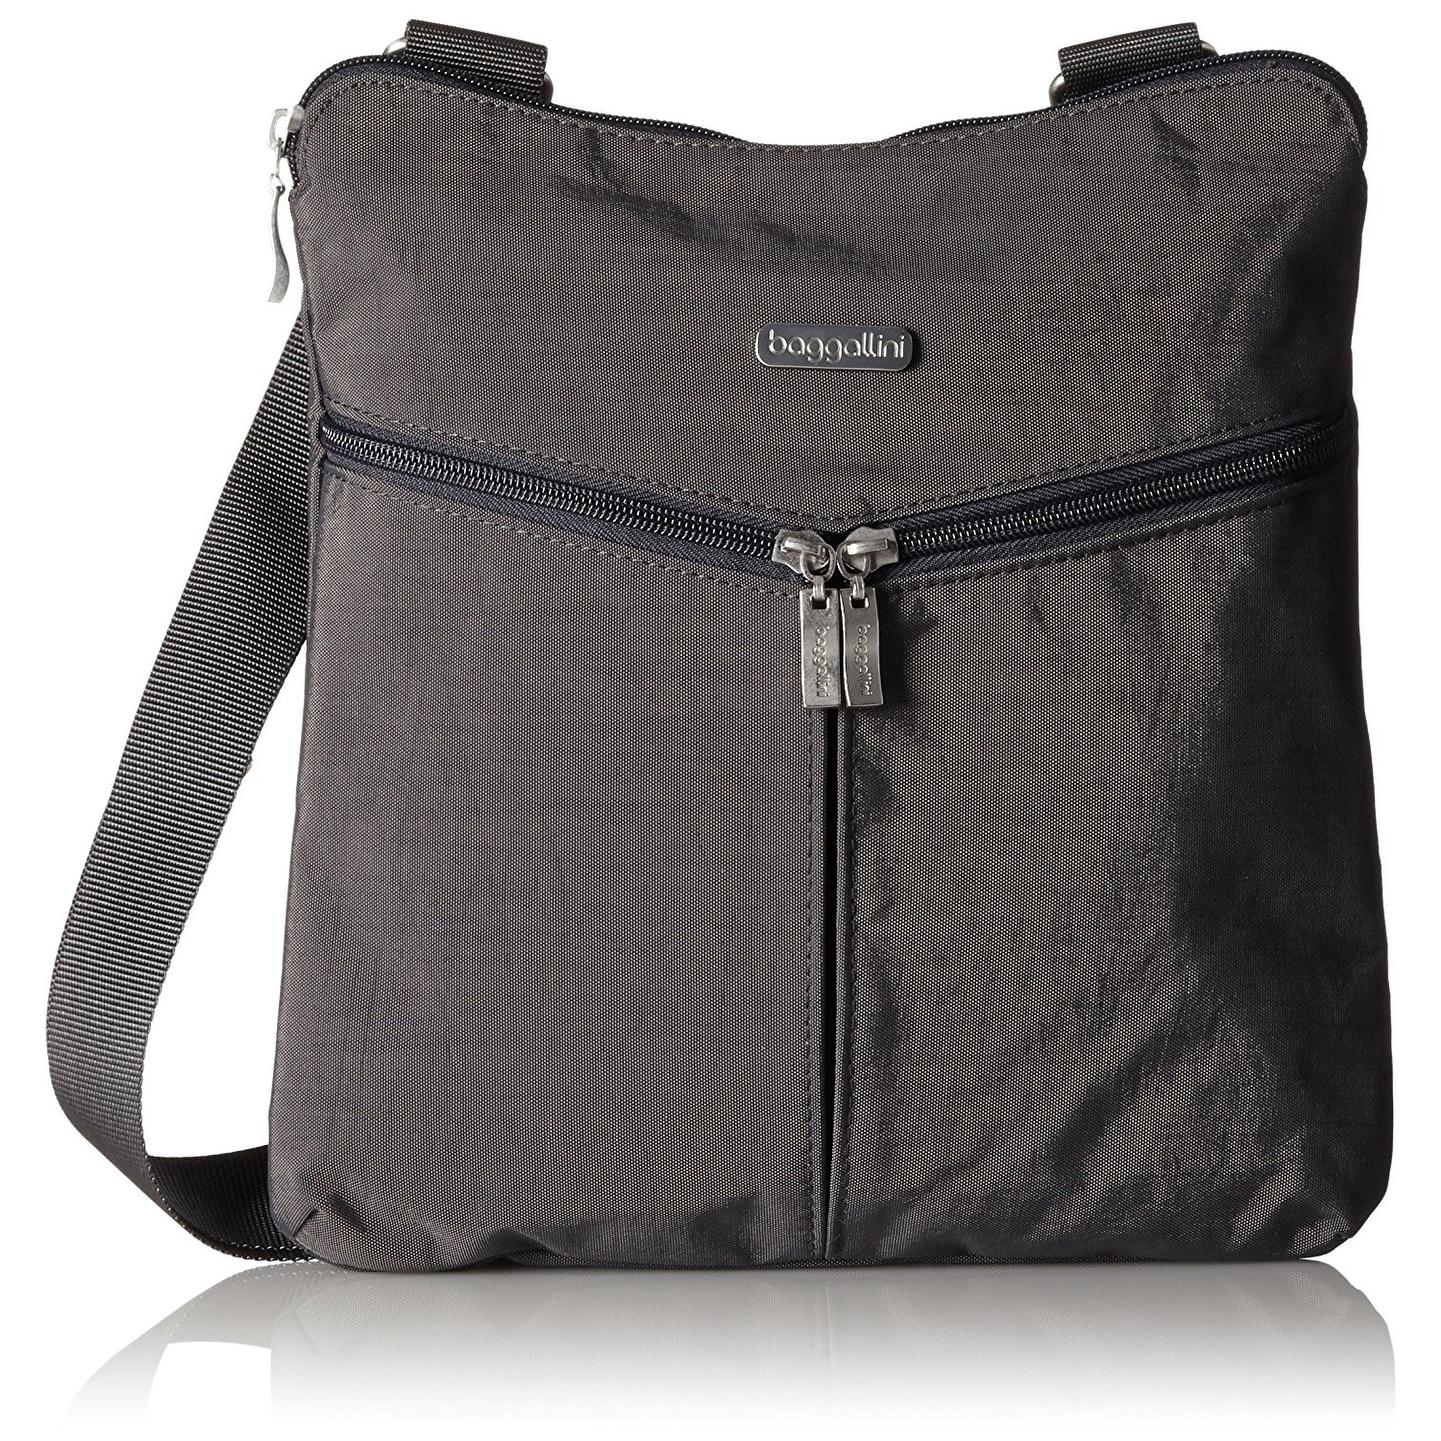 Baggallini Horizon Lightweight Crossbody Bag Multi Pocketed Travel Purse Hrz649clfs Zipper